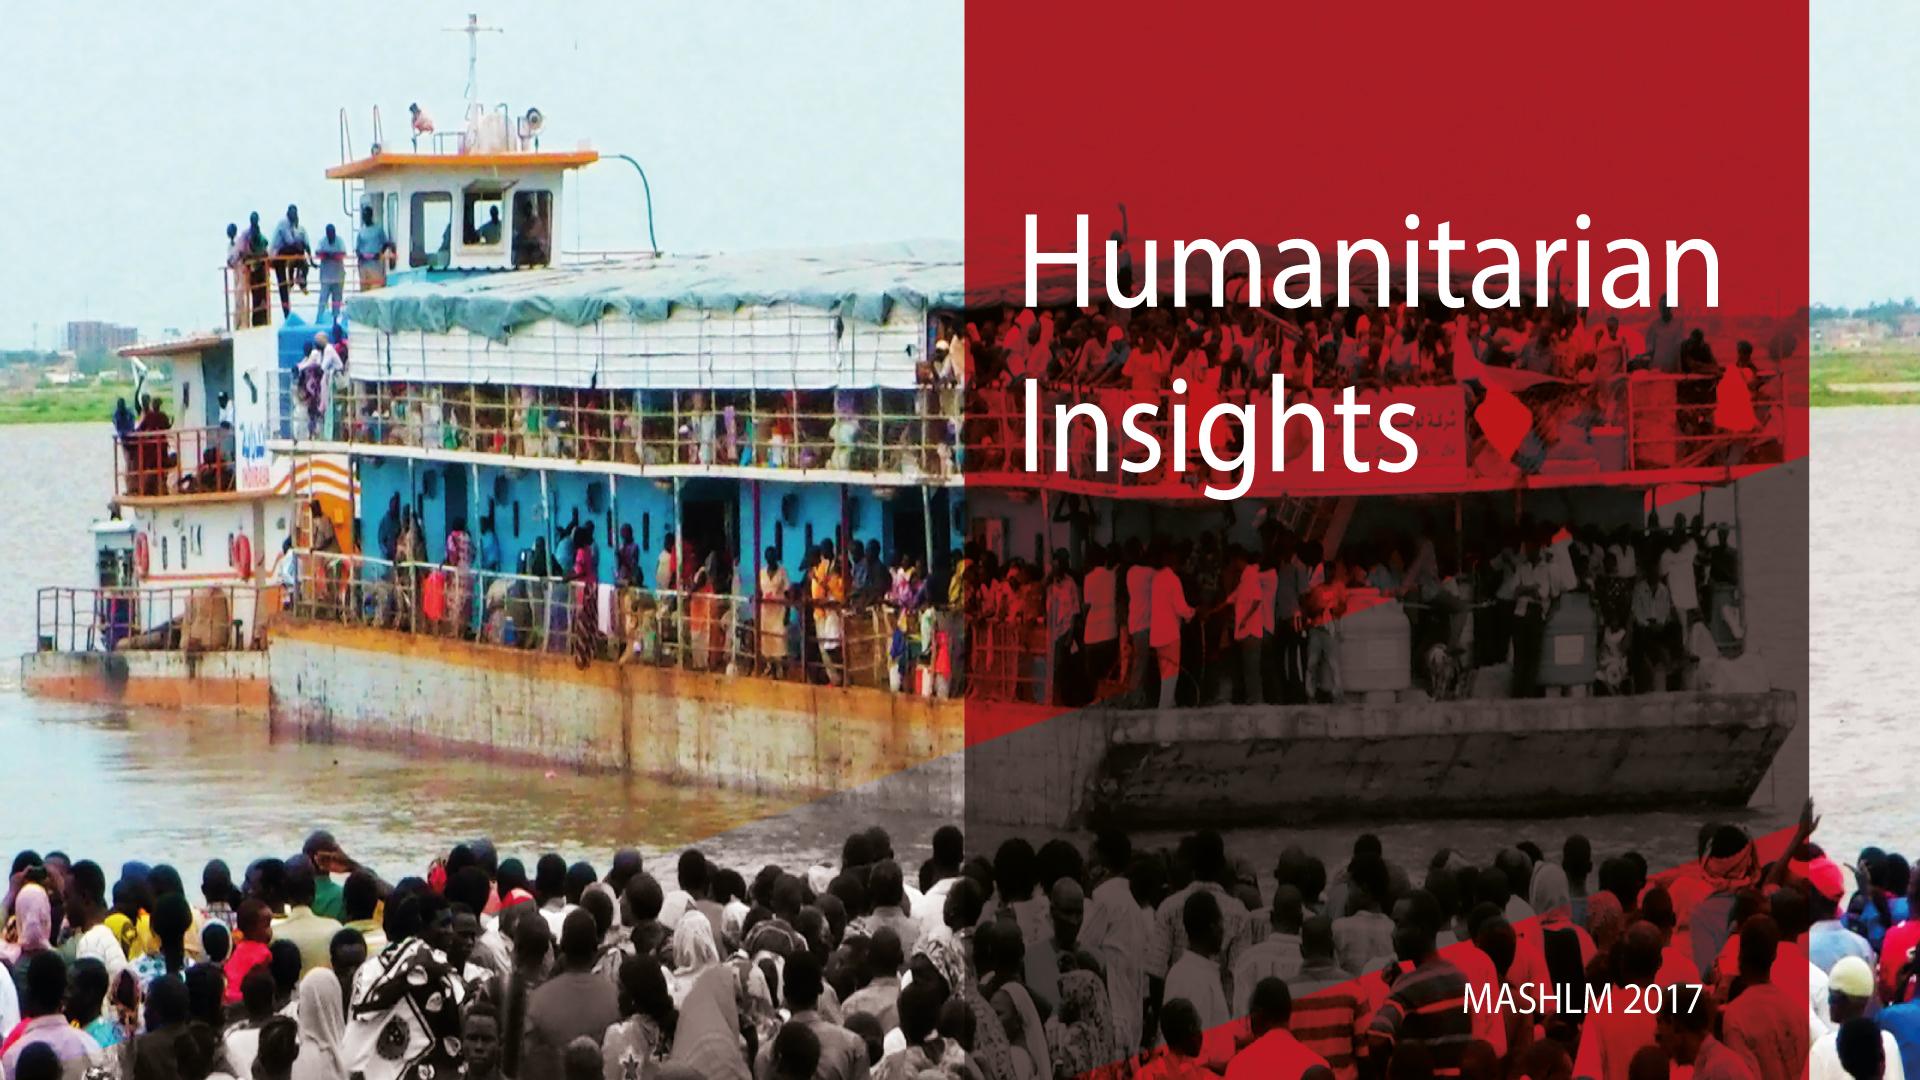 Humanitarian Logistics Supply Chain Seminar